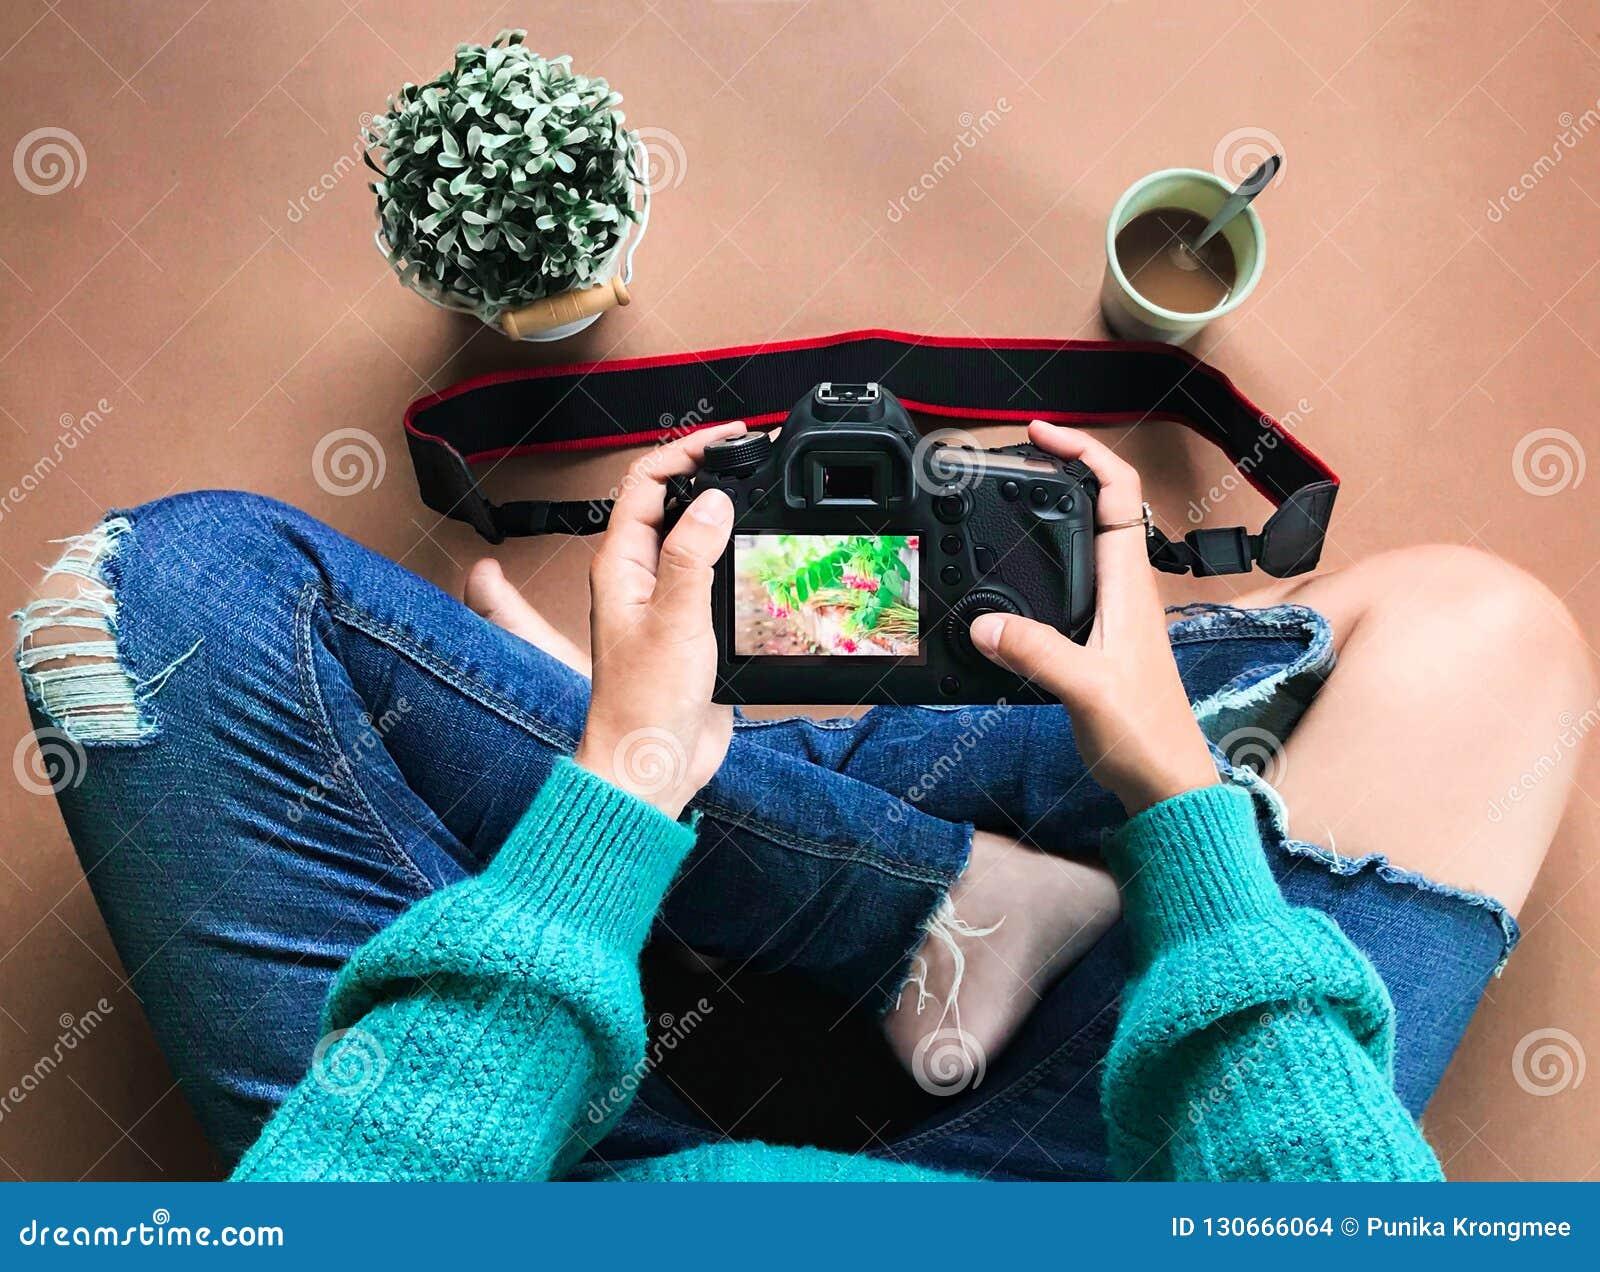 Amateur photographer looks at camera